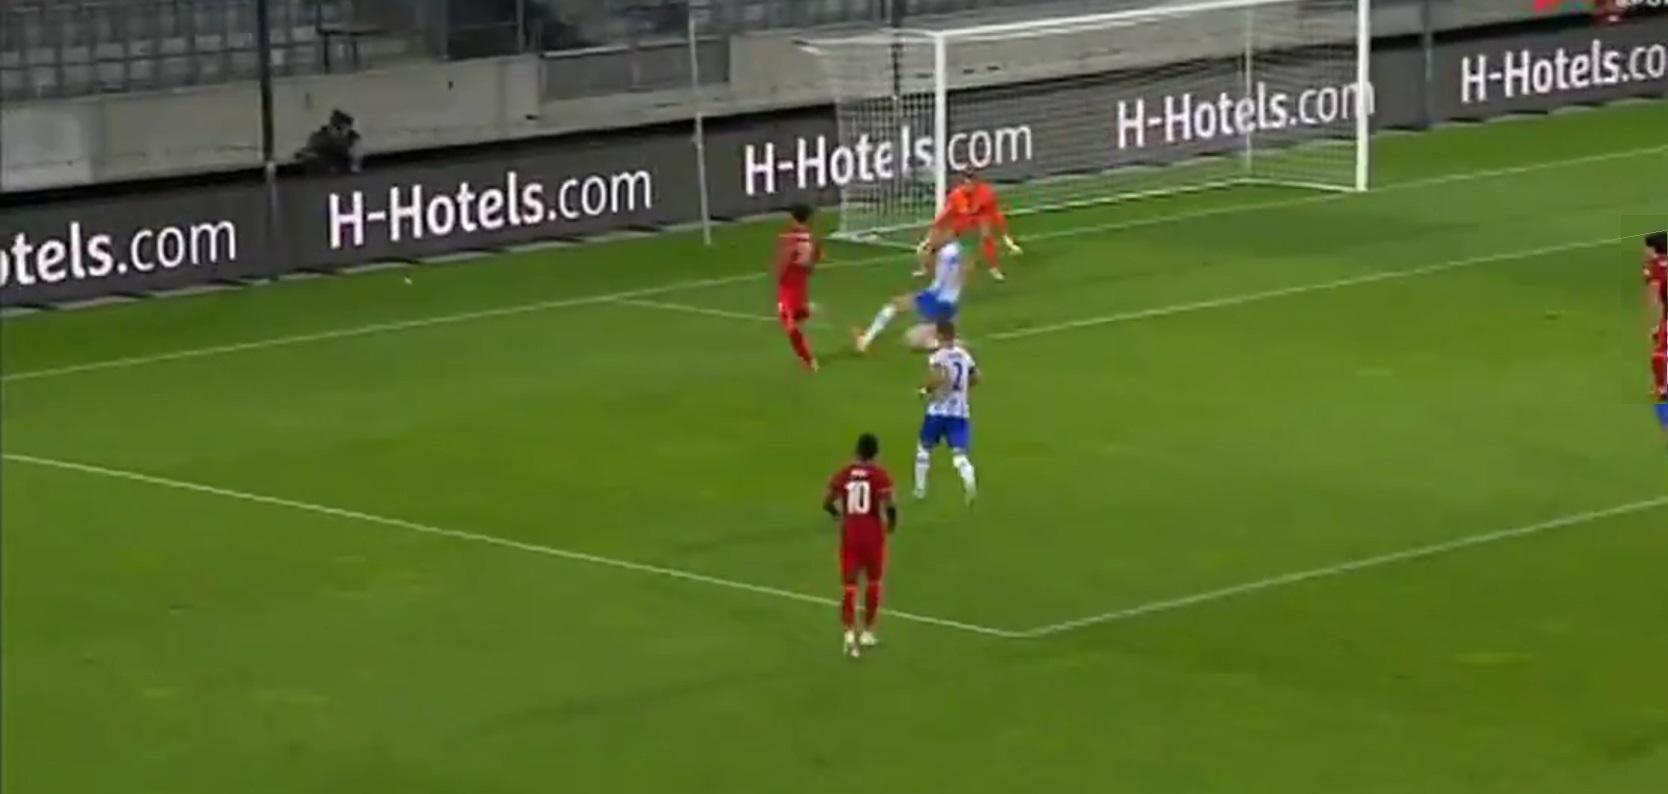 (Video) Taki Minamino links up with Mo Salah to score beautiful Liverpool goal